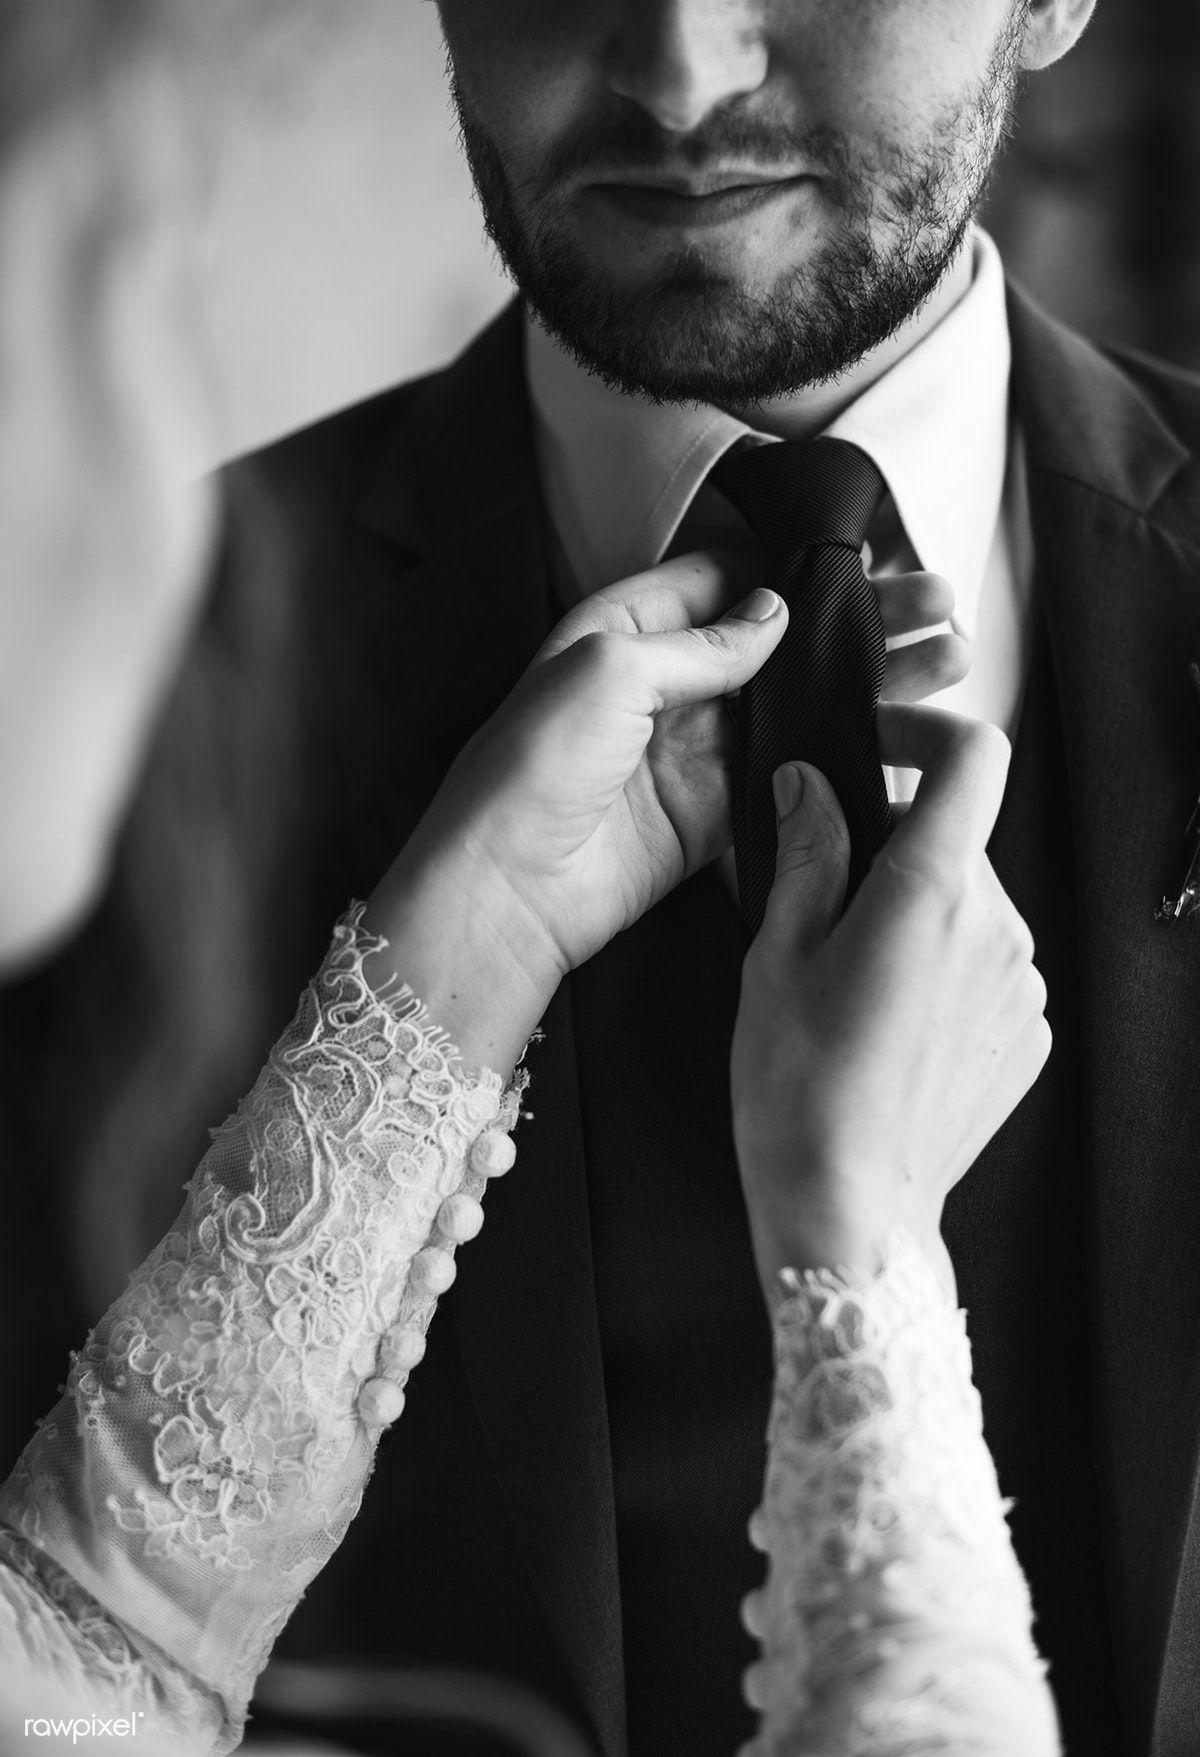 Download premium photo of Bride Helping Groom Dressing Up